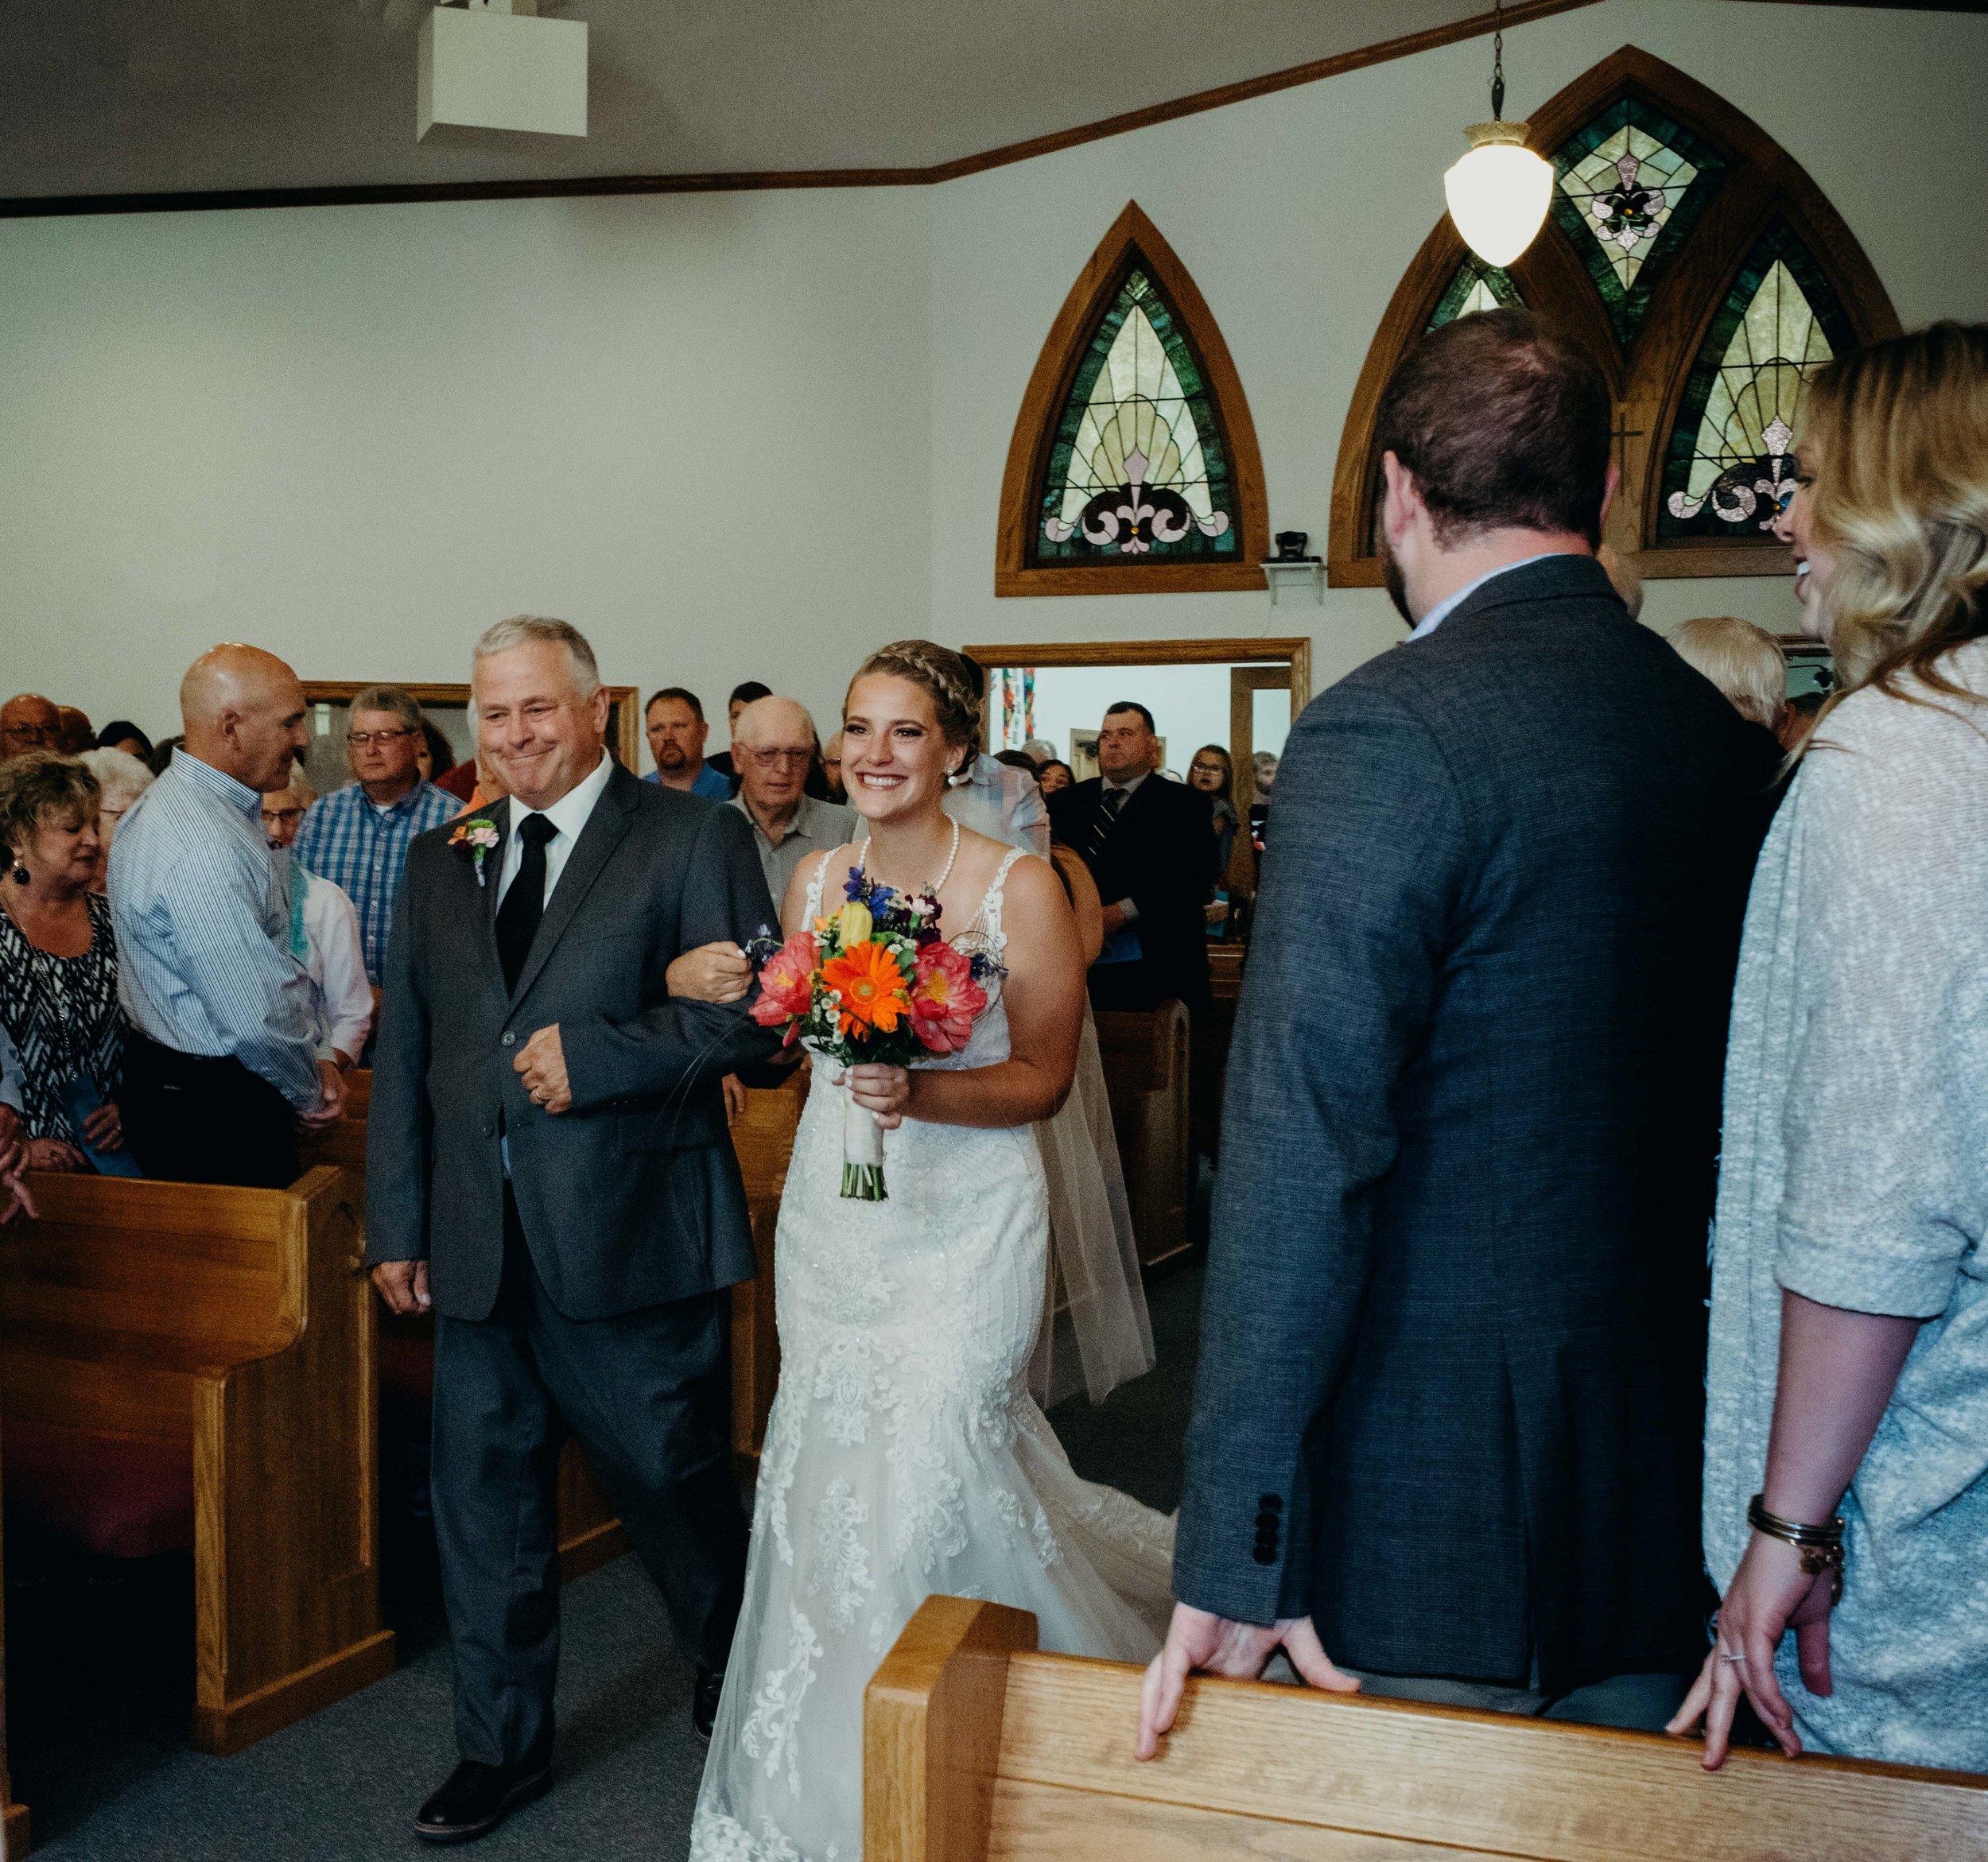 Iowa wedding_Dawn McClannan Photo-37.jpg